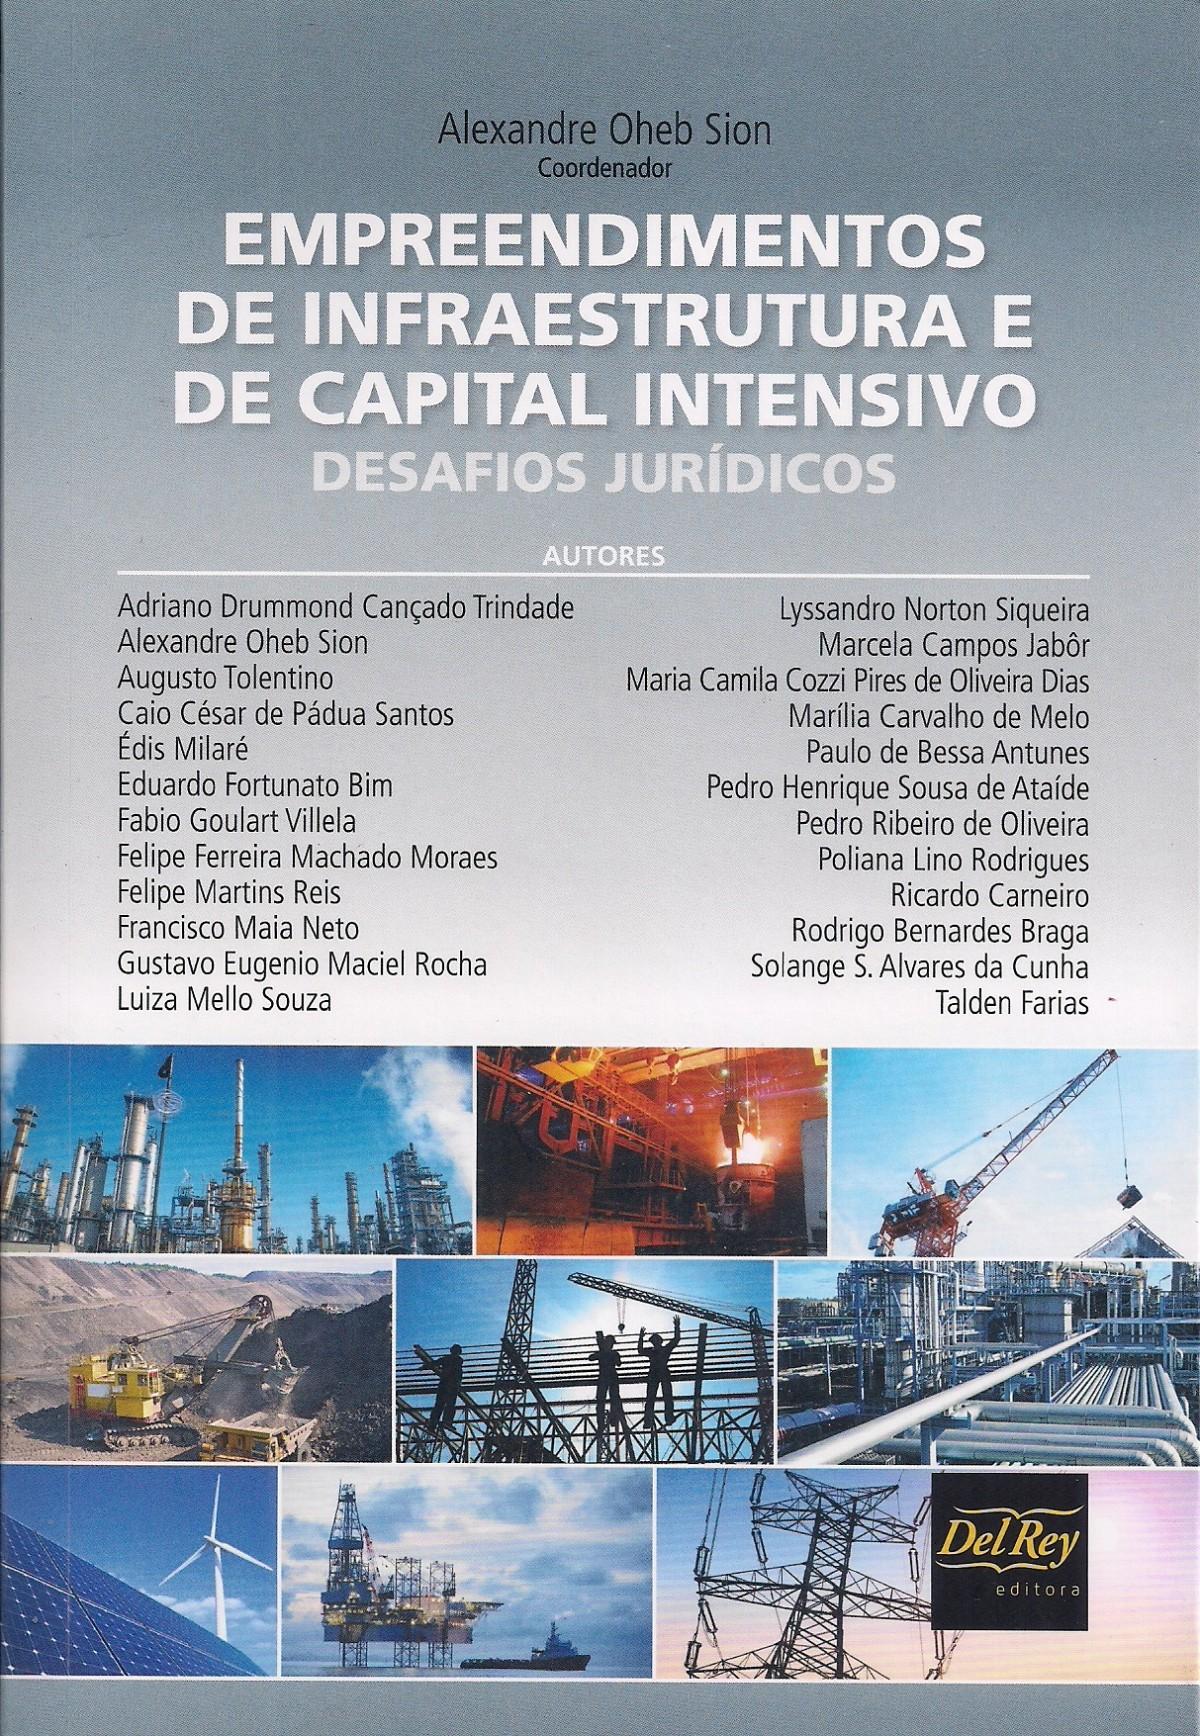 Foto 1 - Empreendimentos de Infraestrutura e de Capital Intensivo - Desafios Jurídicos